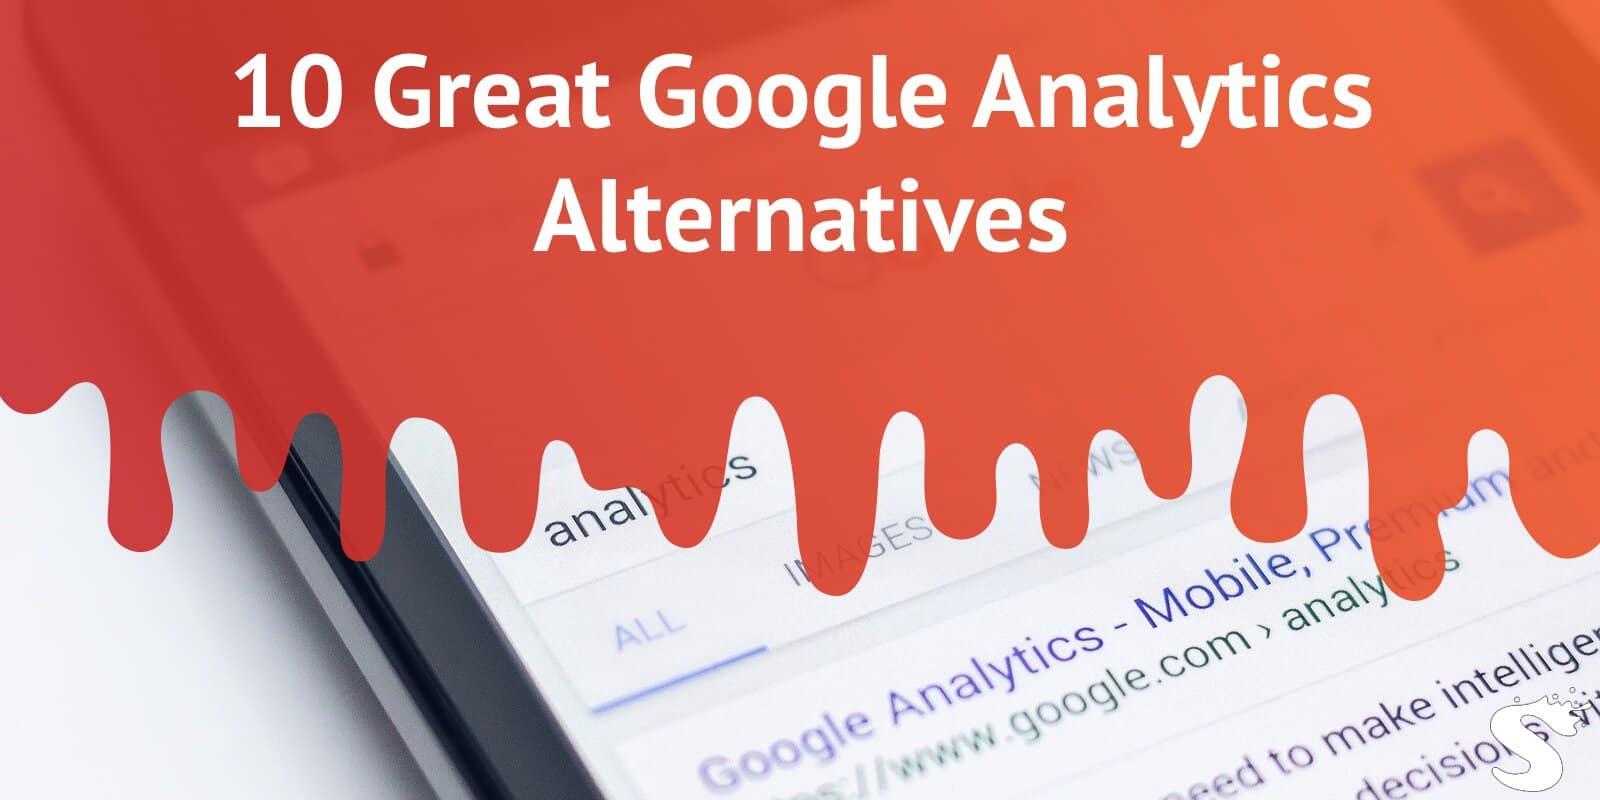 10 Great Google Analytics Alternatives